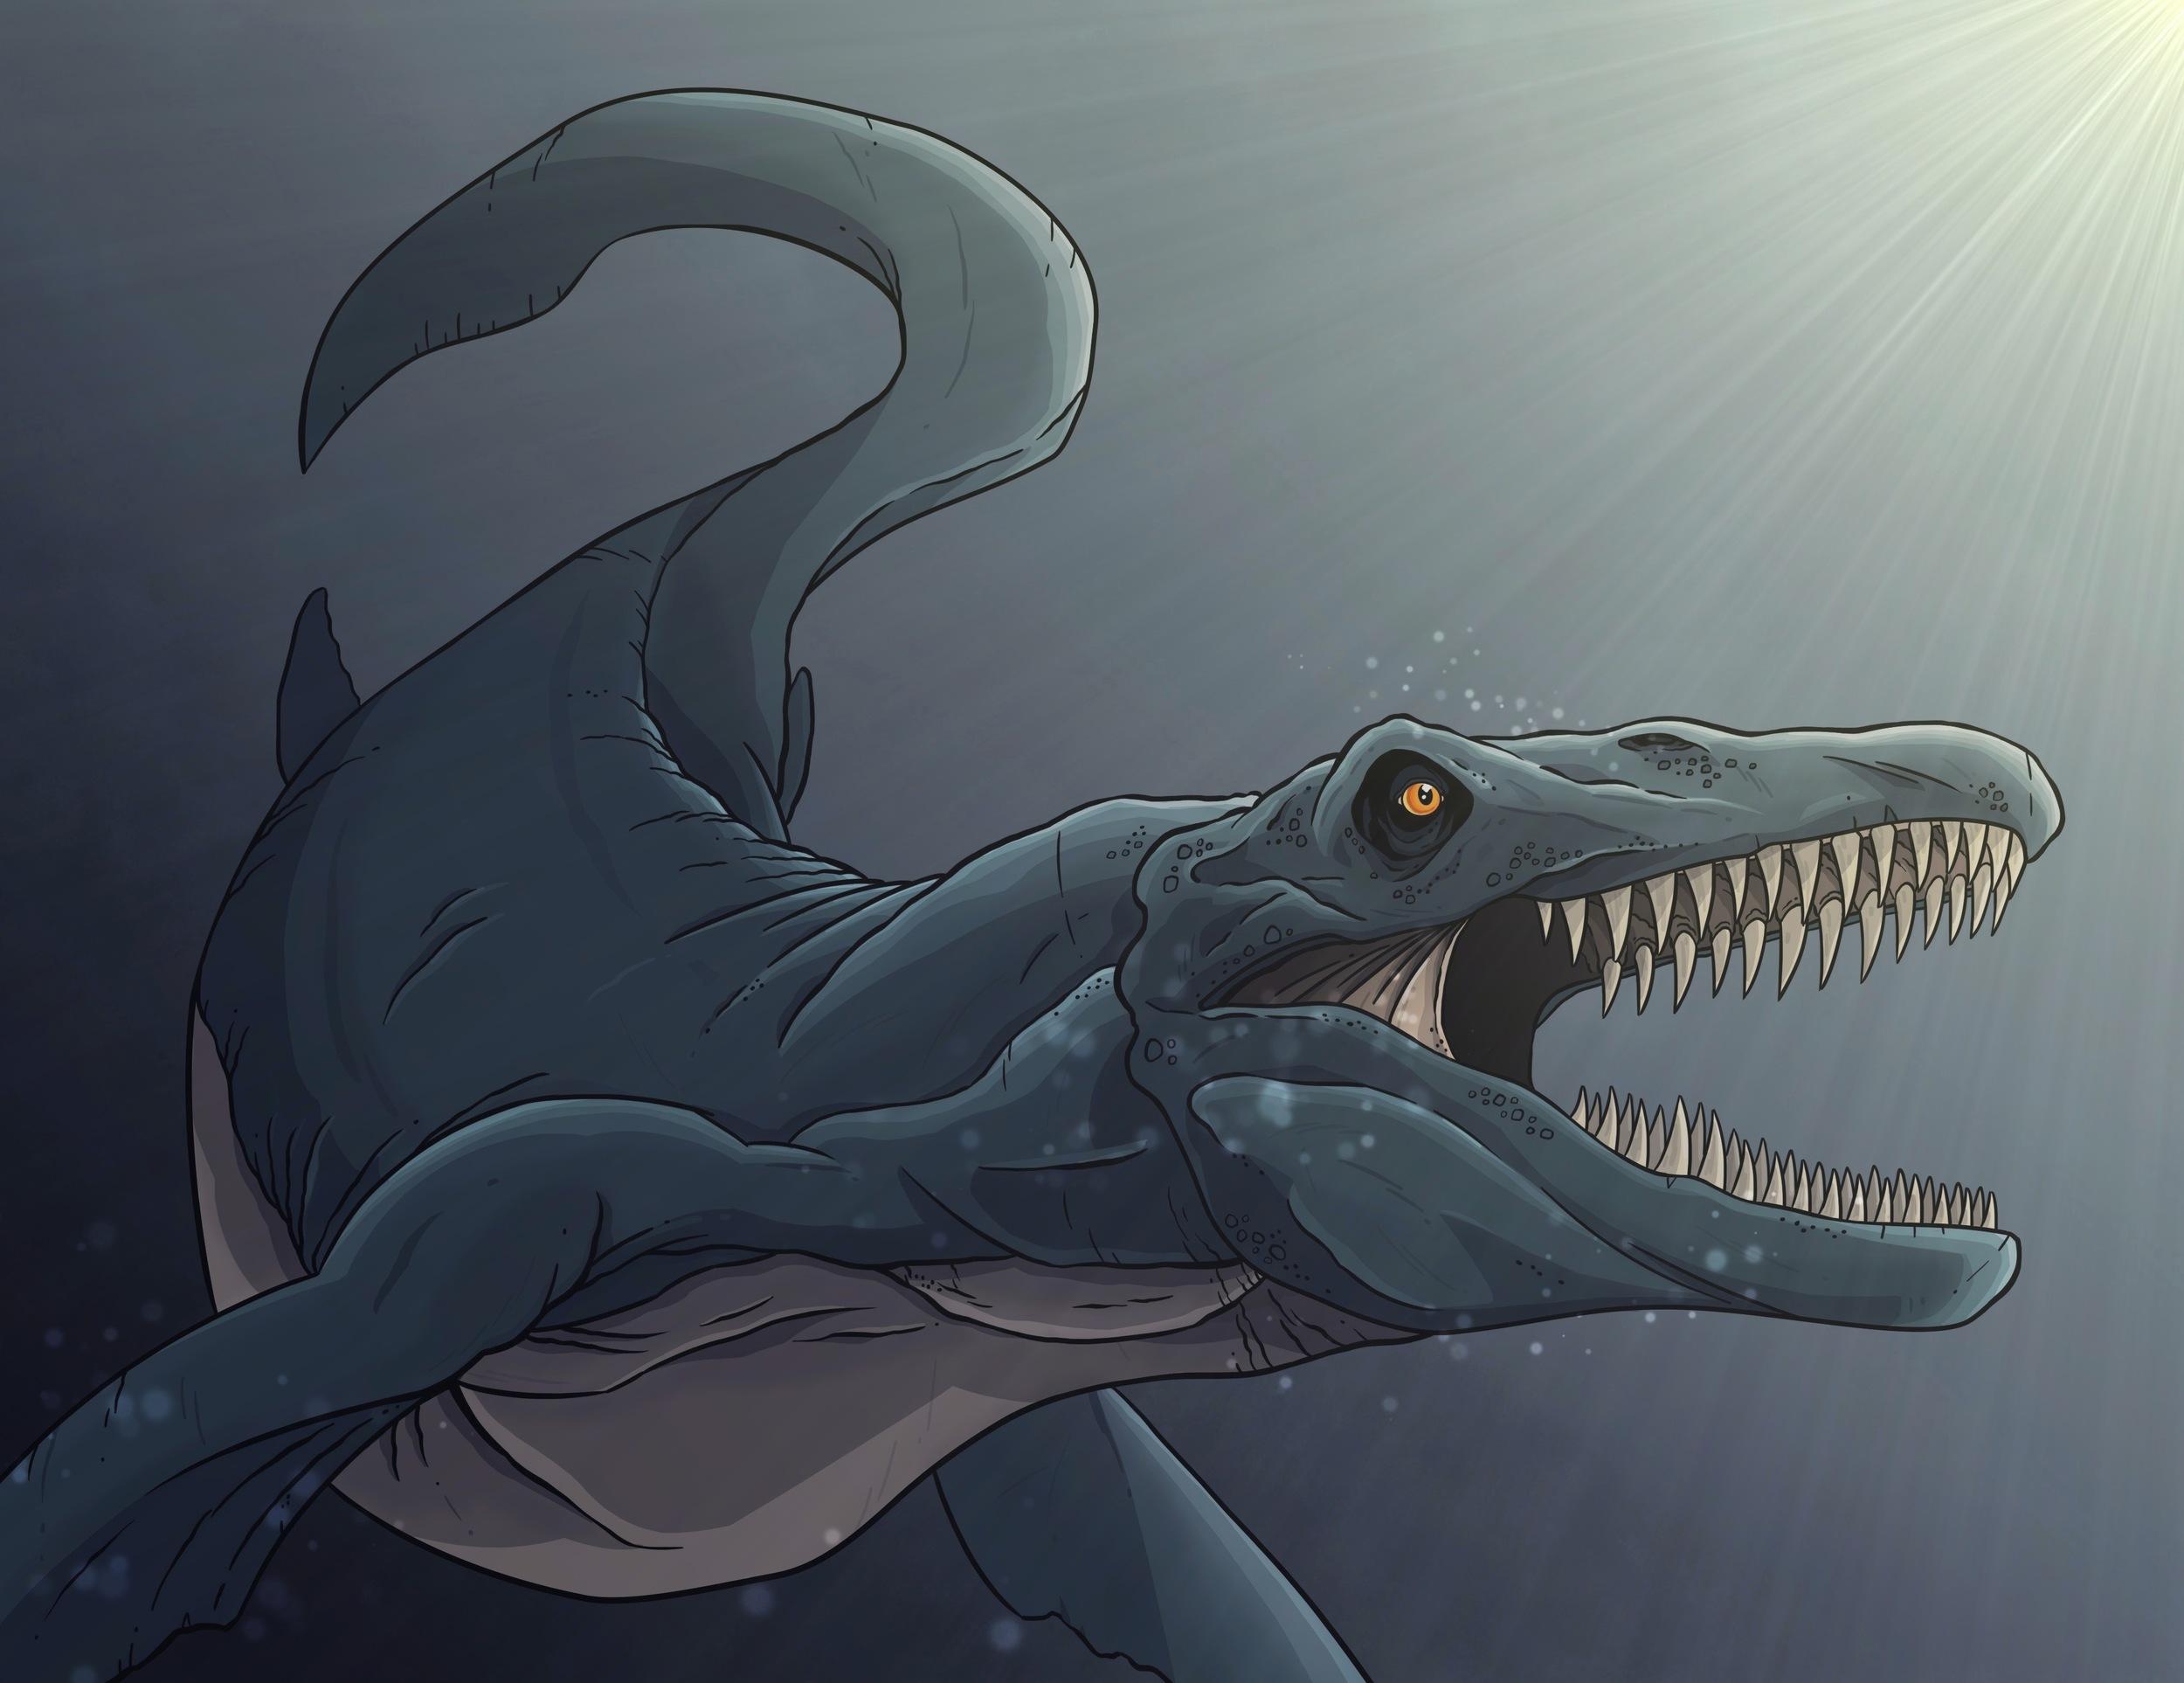 An aquatic reptile, in fact, not a dinosaur.